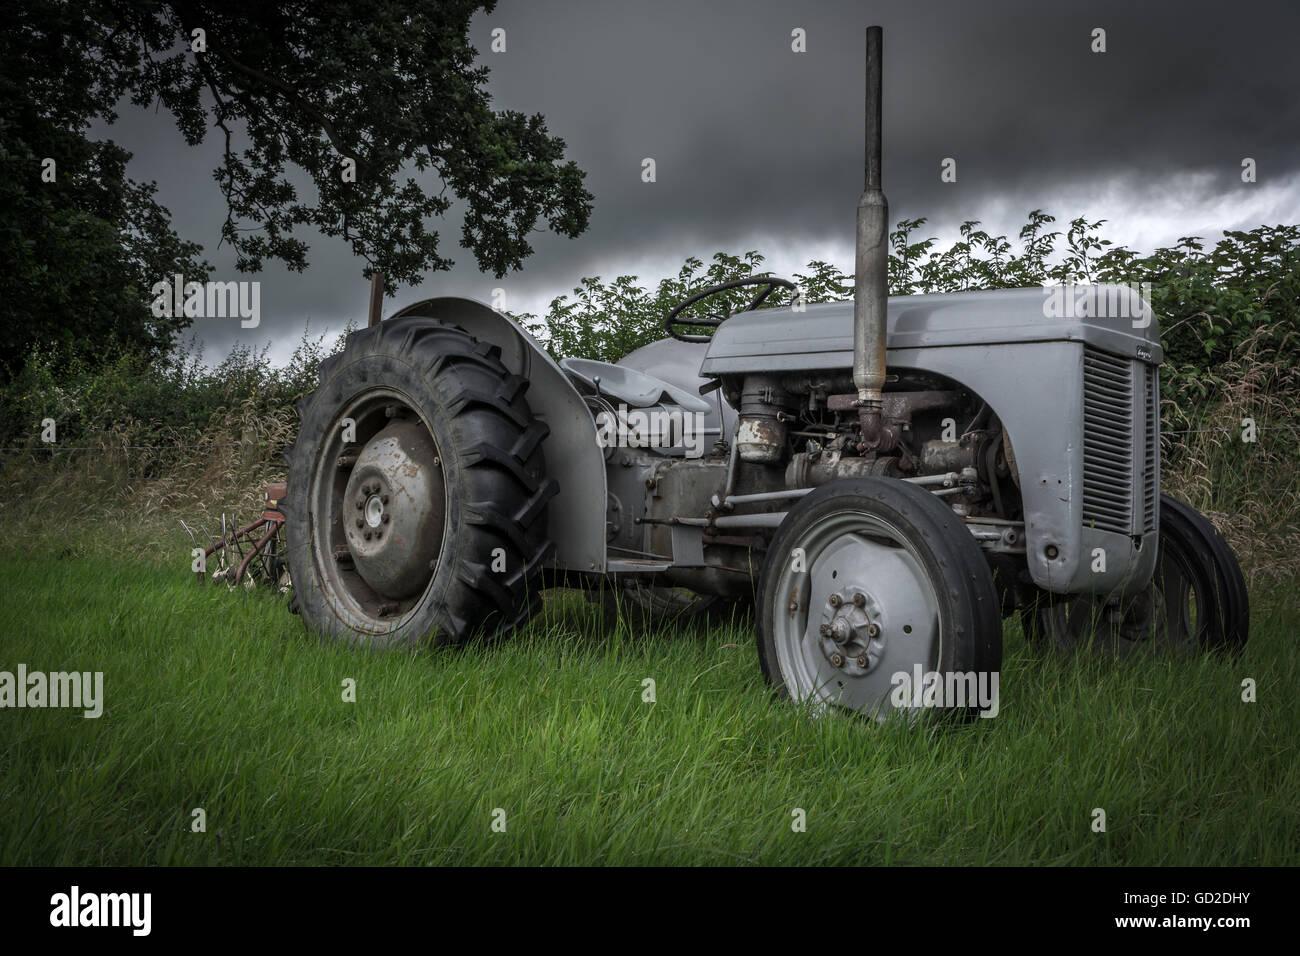 Vintage Ferguson Tractor - Stock Image